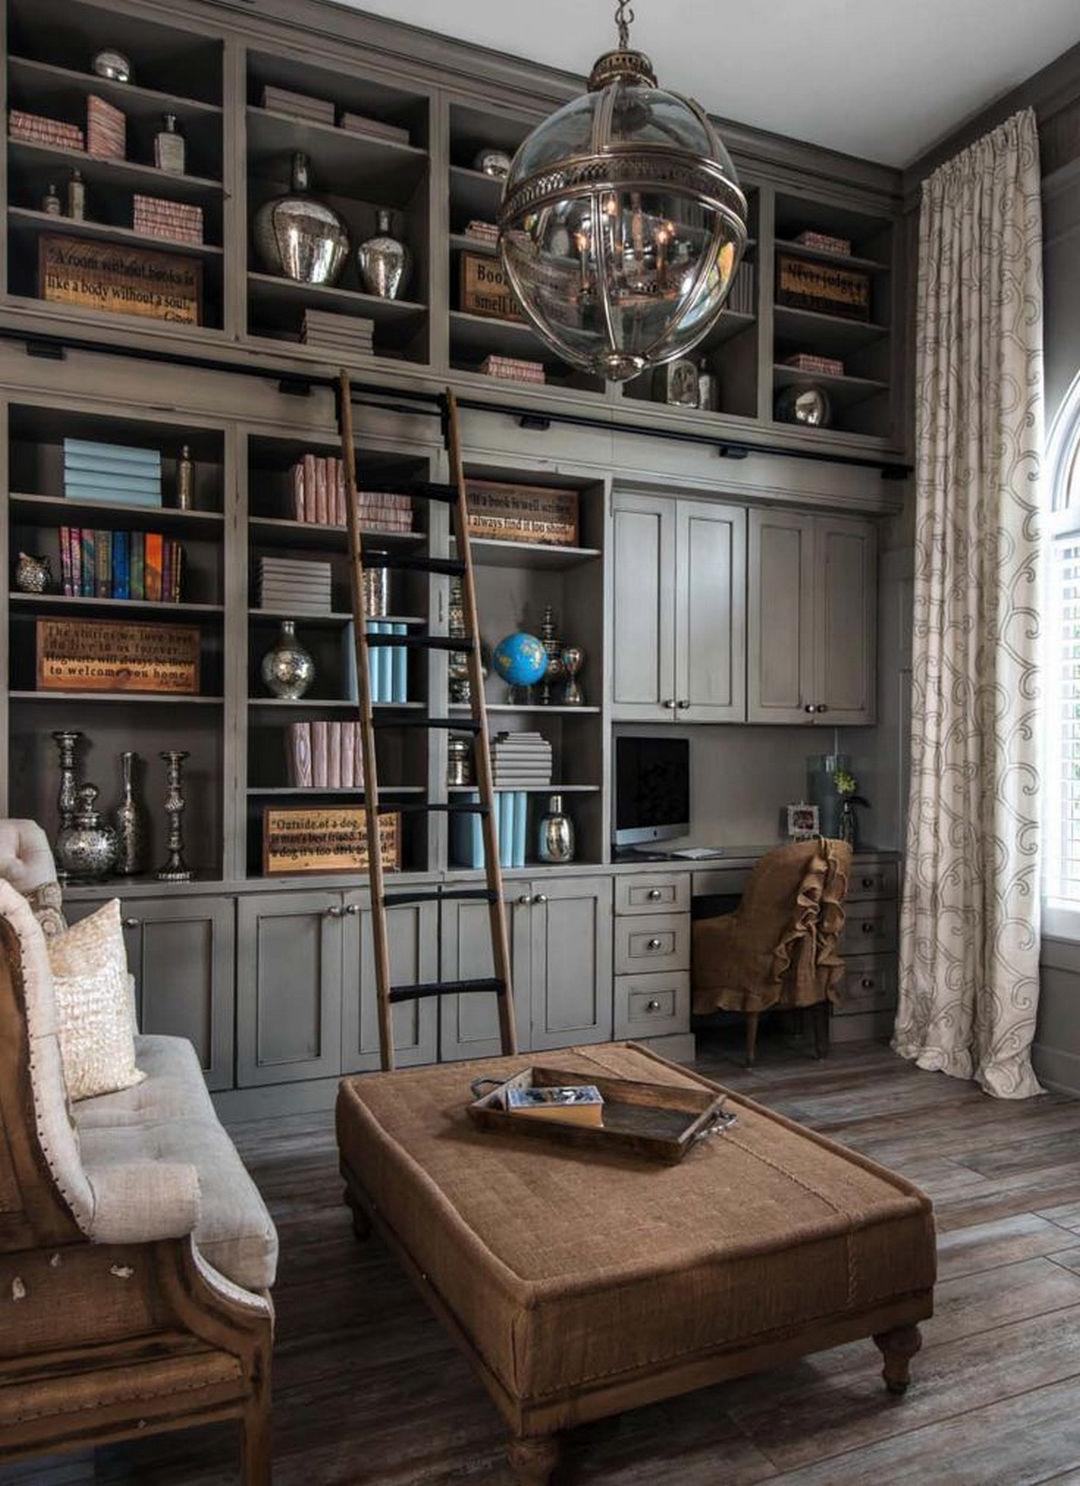 81 Cozy Home Library Interior Ideas Cozy Interiors And